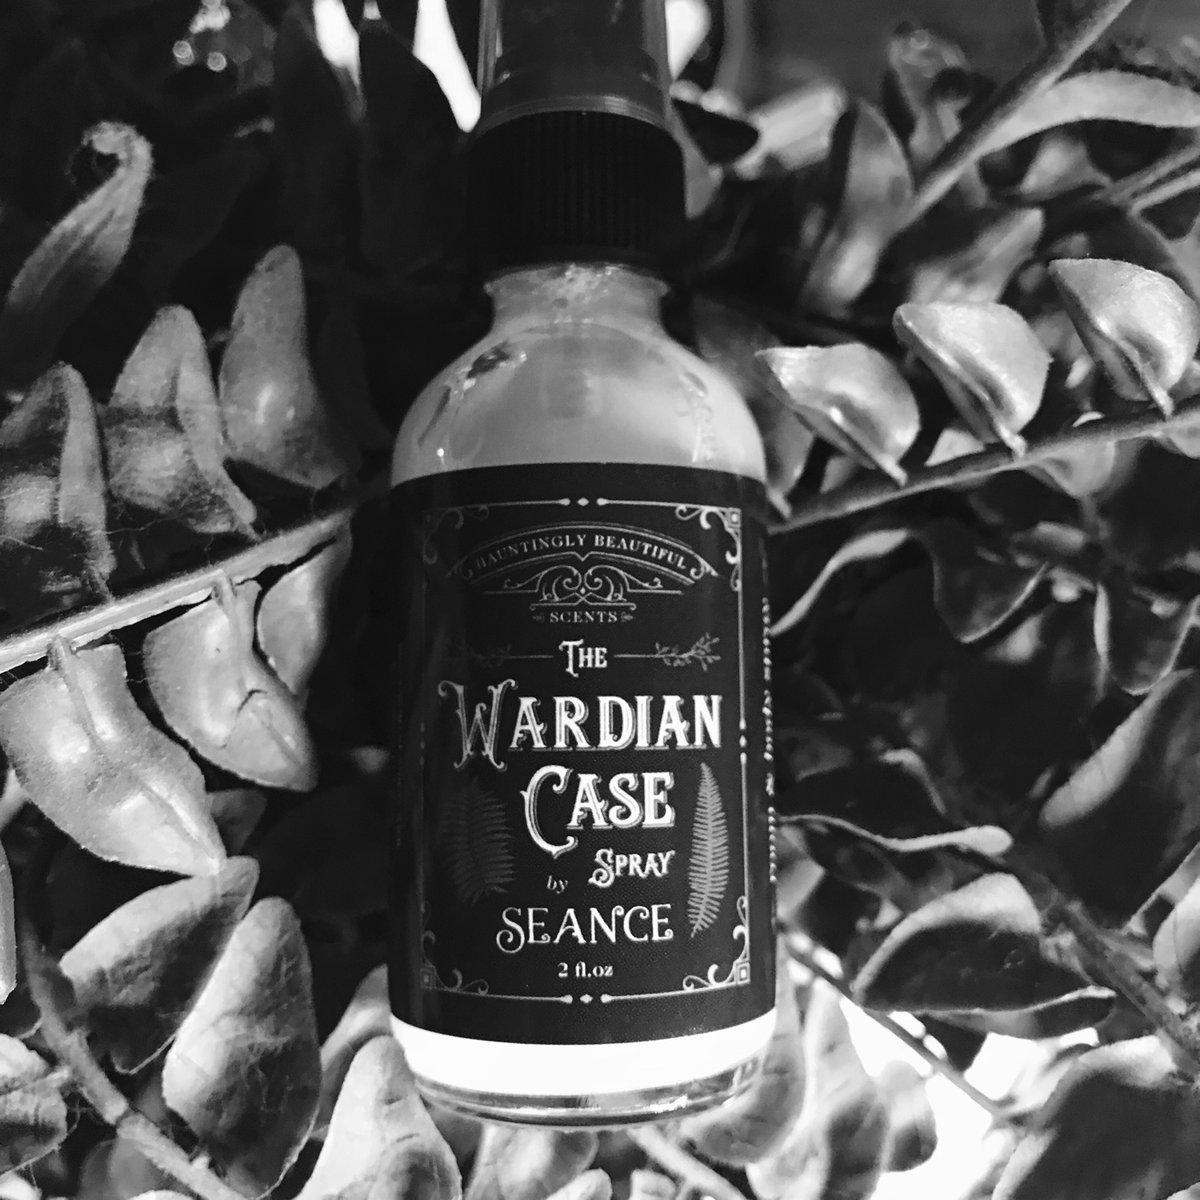 wardian-case-spray.jpg